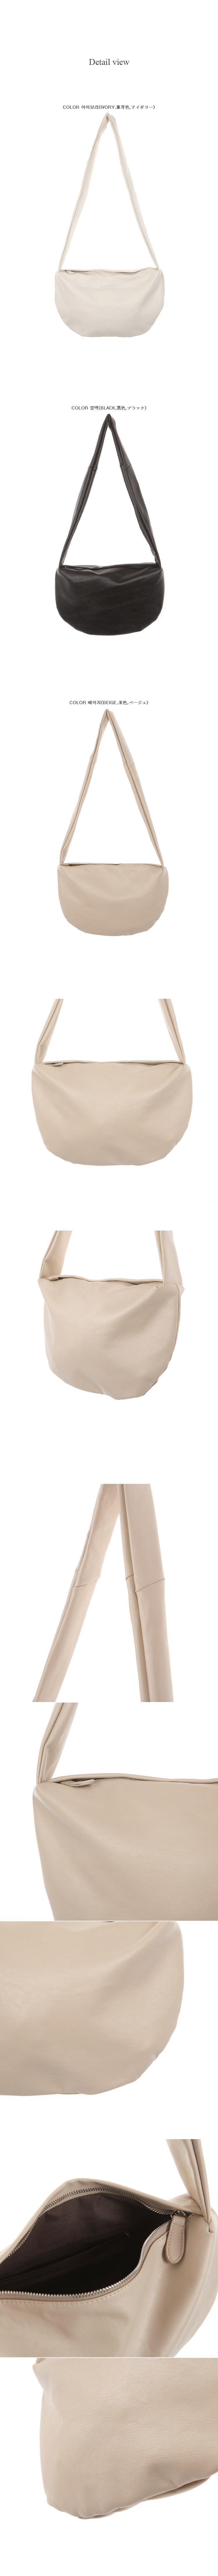 Pita cross bag